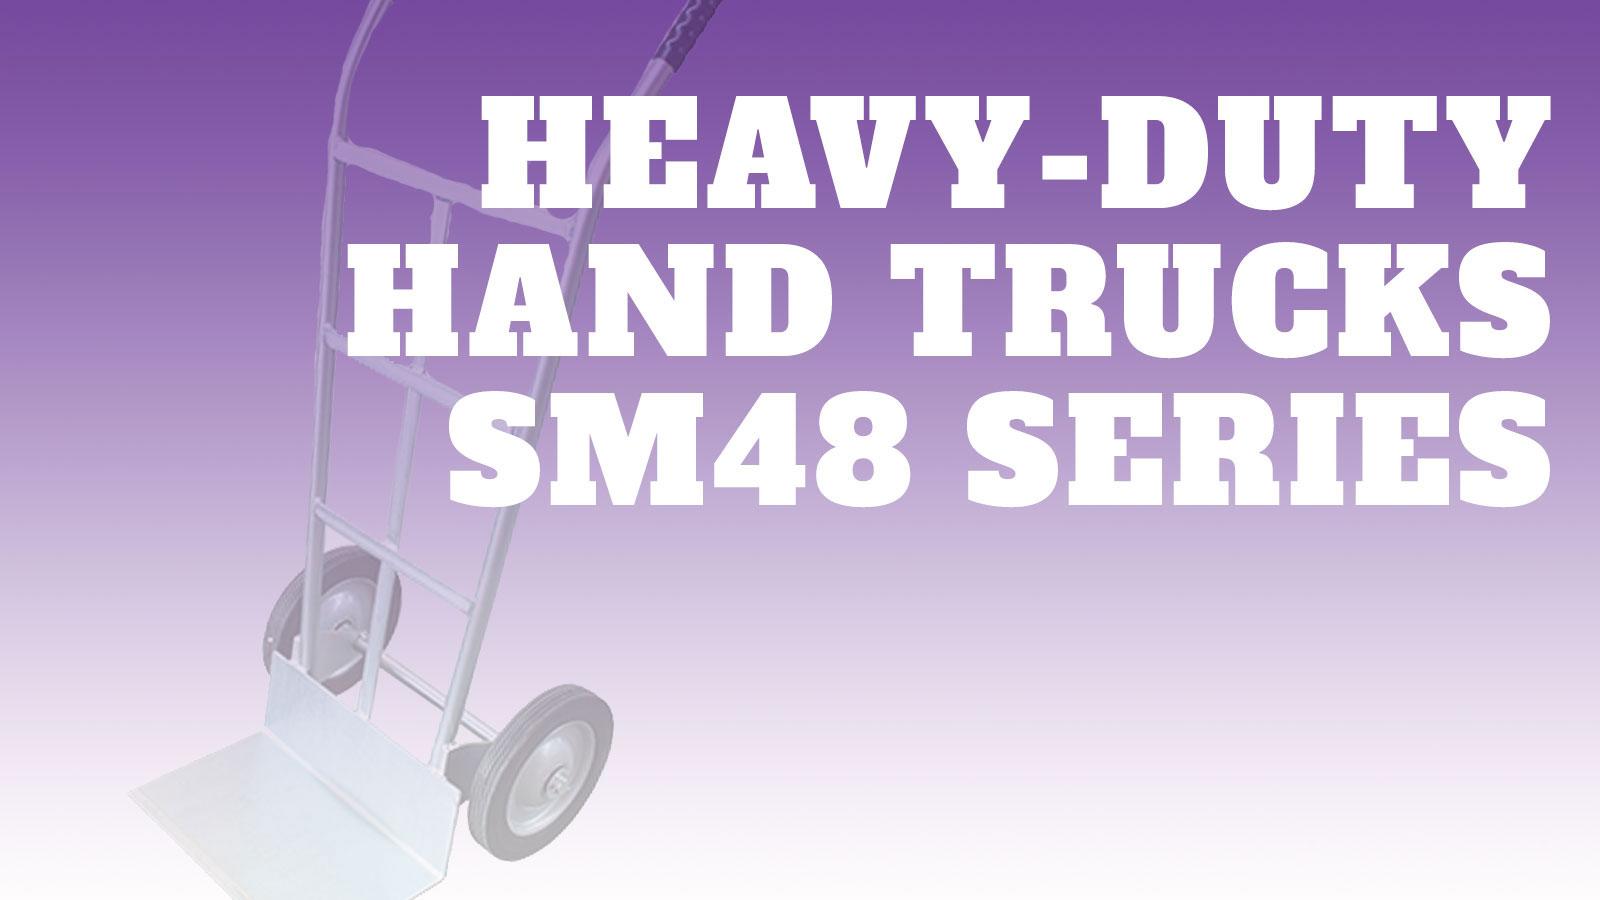 HandTruck-Heavy-Duty-SM48